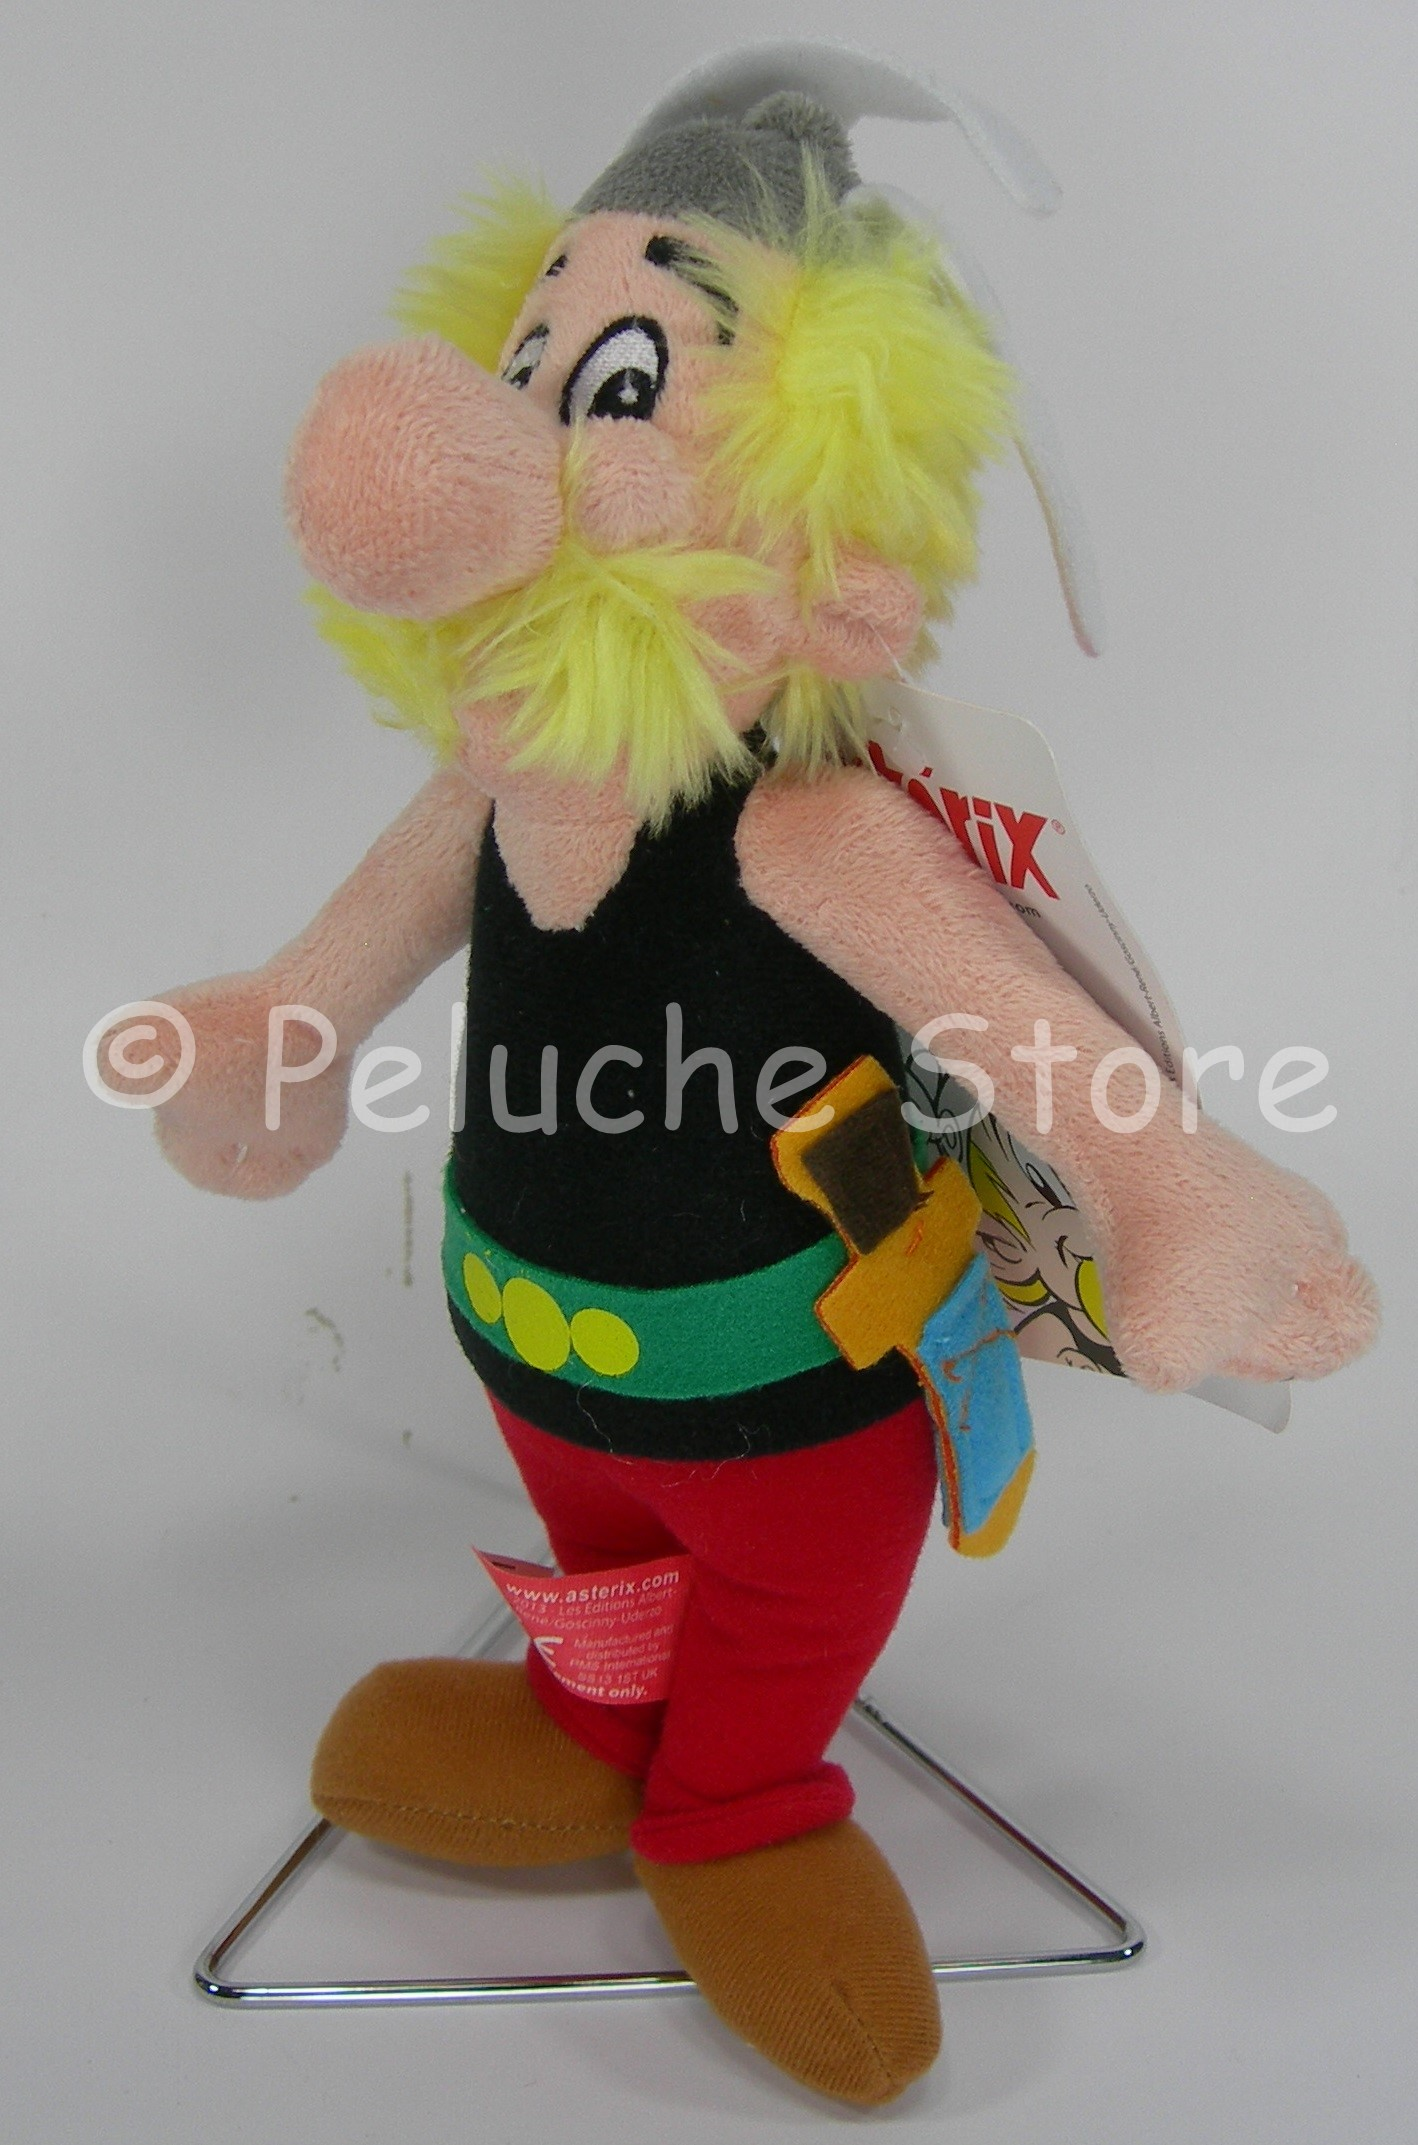 Asterix e Obelix Idefix  peluche 25 cm Originale Qualità Velluto